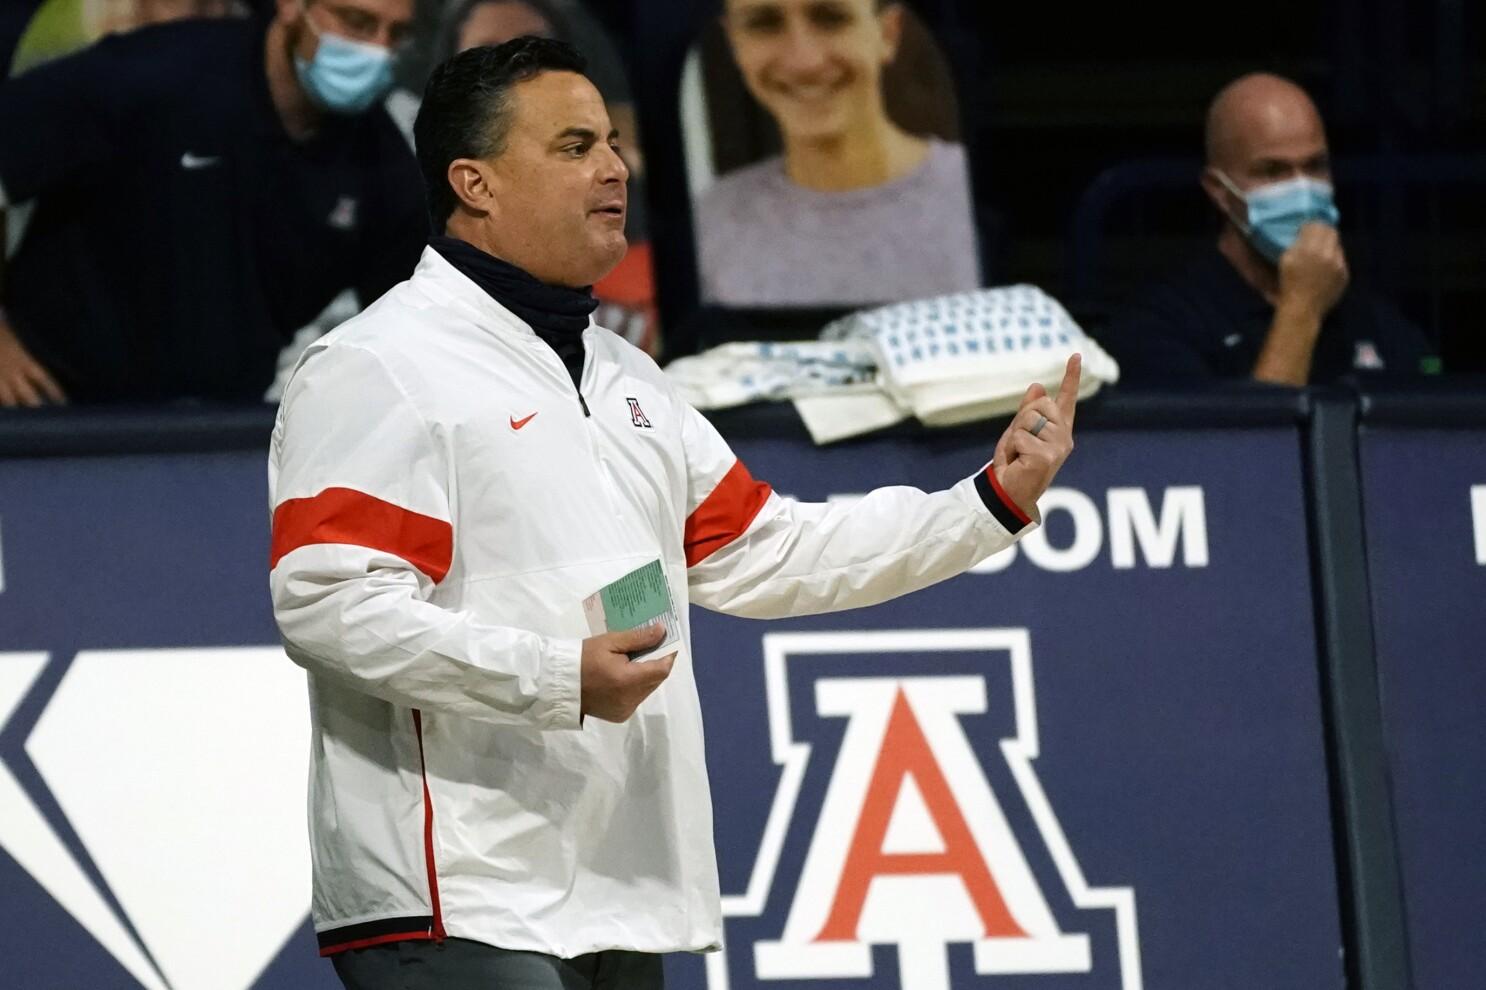 Arizona Men S Basketball Self Imposes One Year Postseason Ban Los Angeles Times